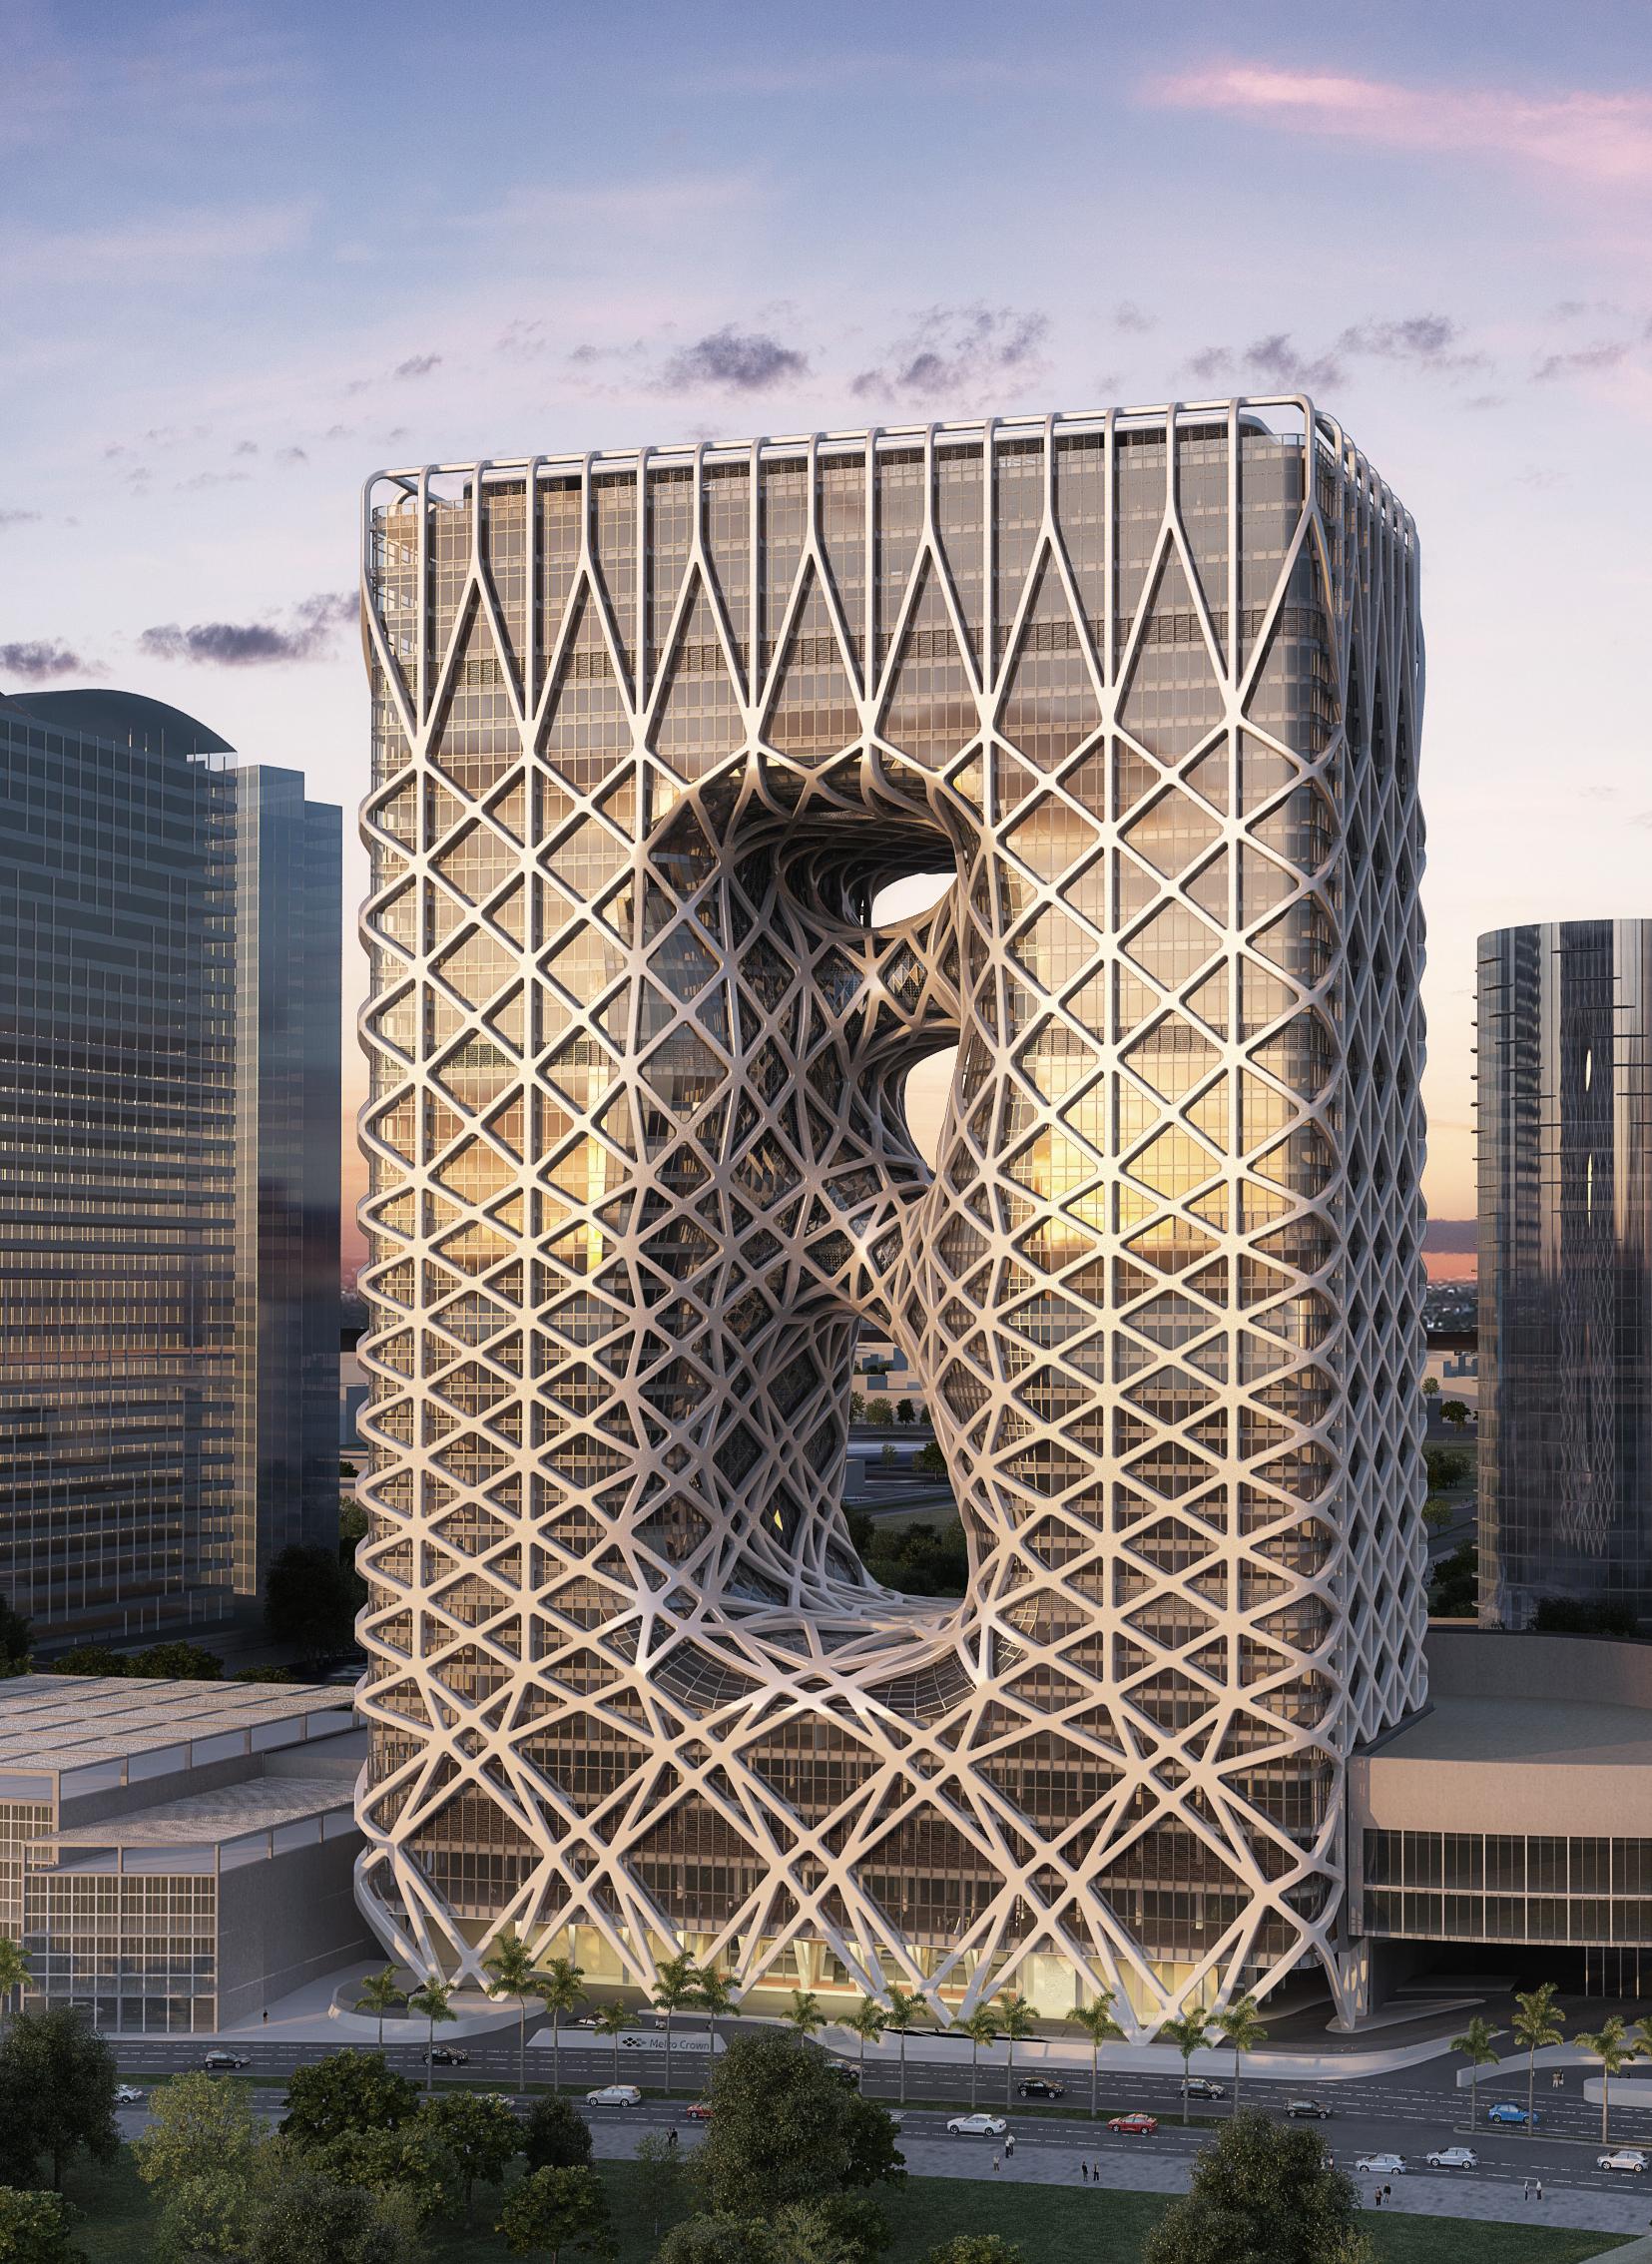 Futuristic Architecture by Zaha Hadid Architects - Architecture Beast